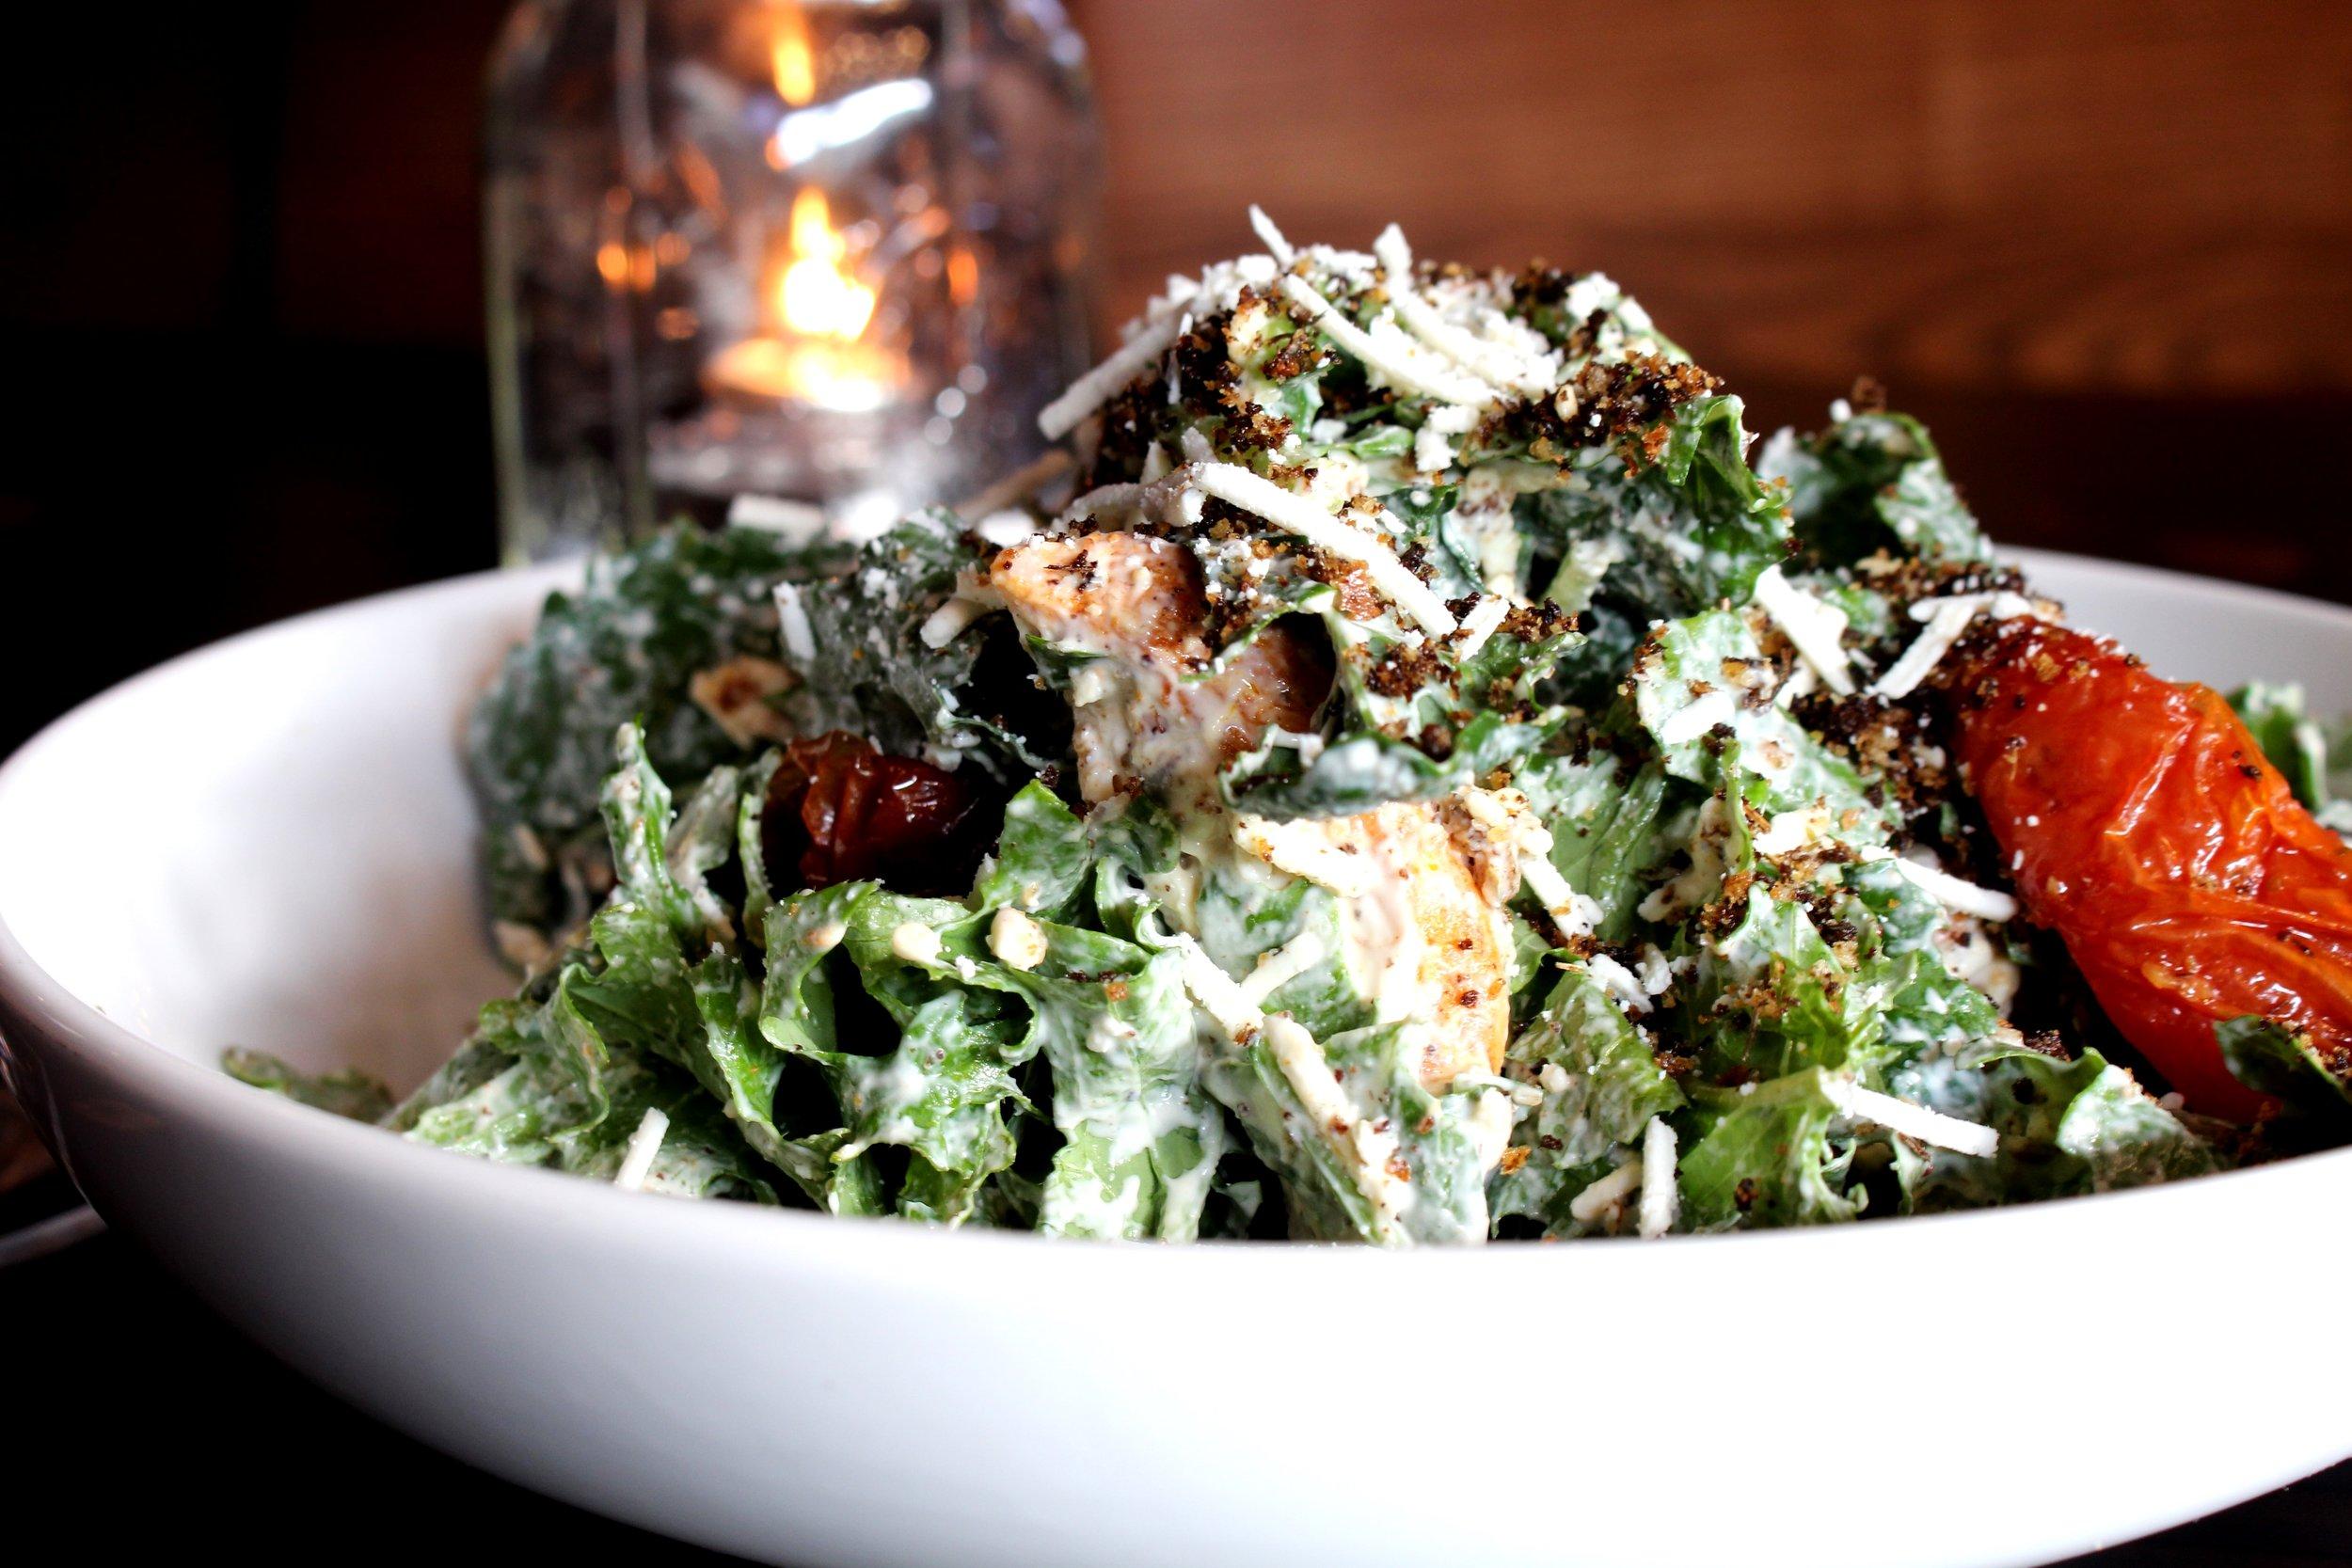 Heart Kale Smoked Chicken Salad